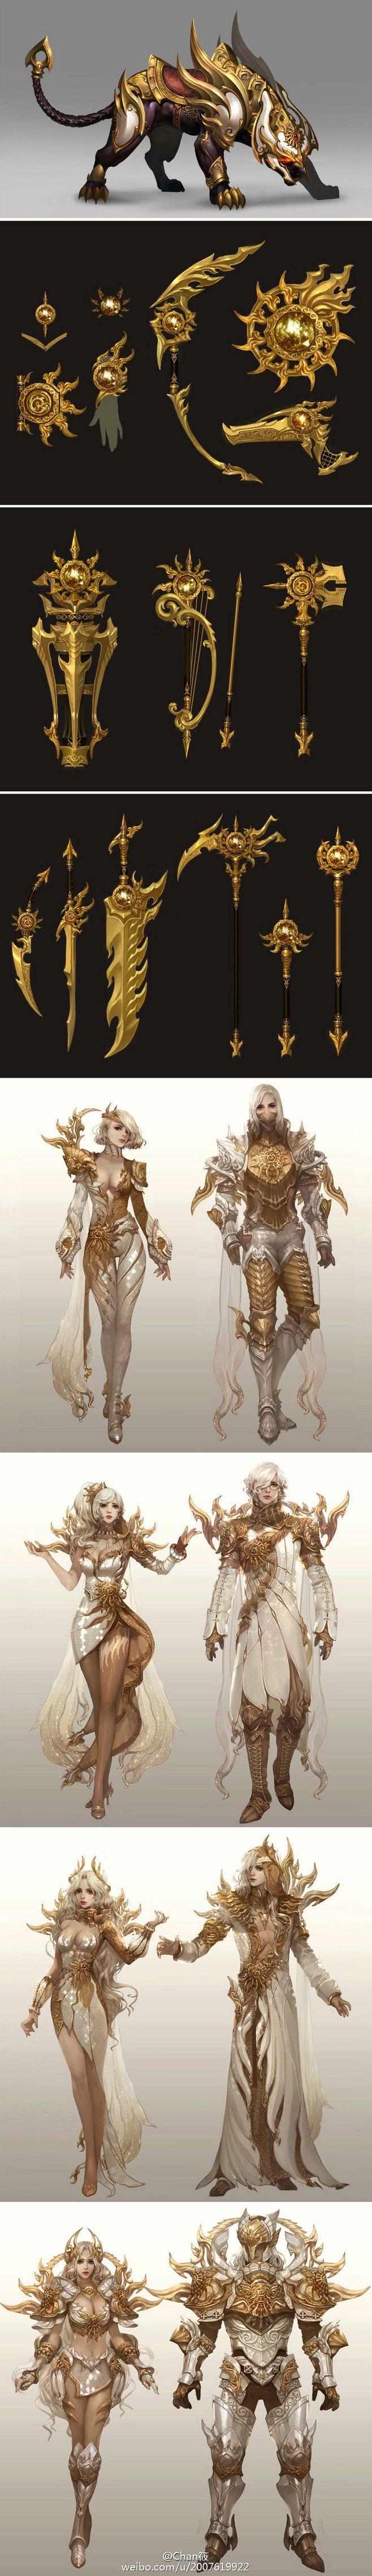 White and Gold Dynasty. King Regalia Idea